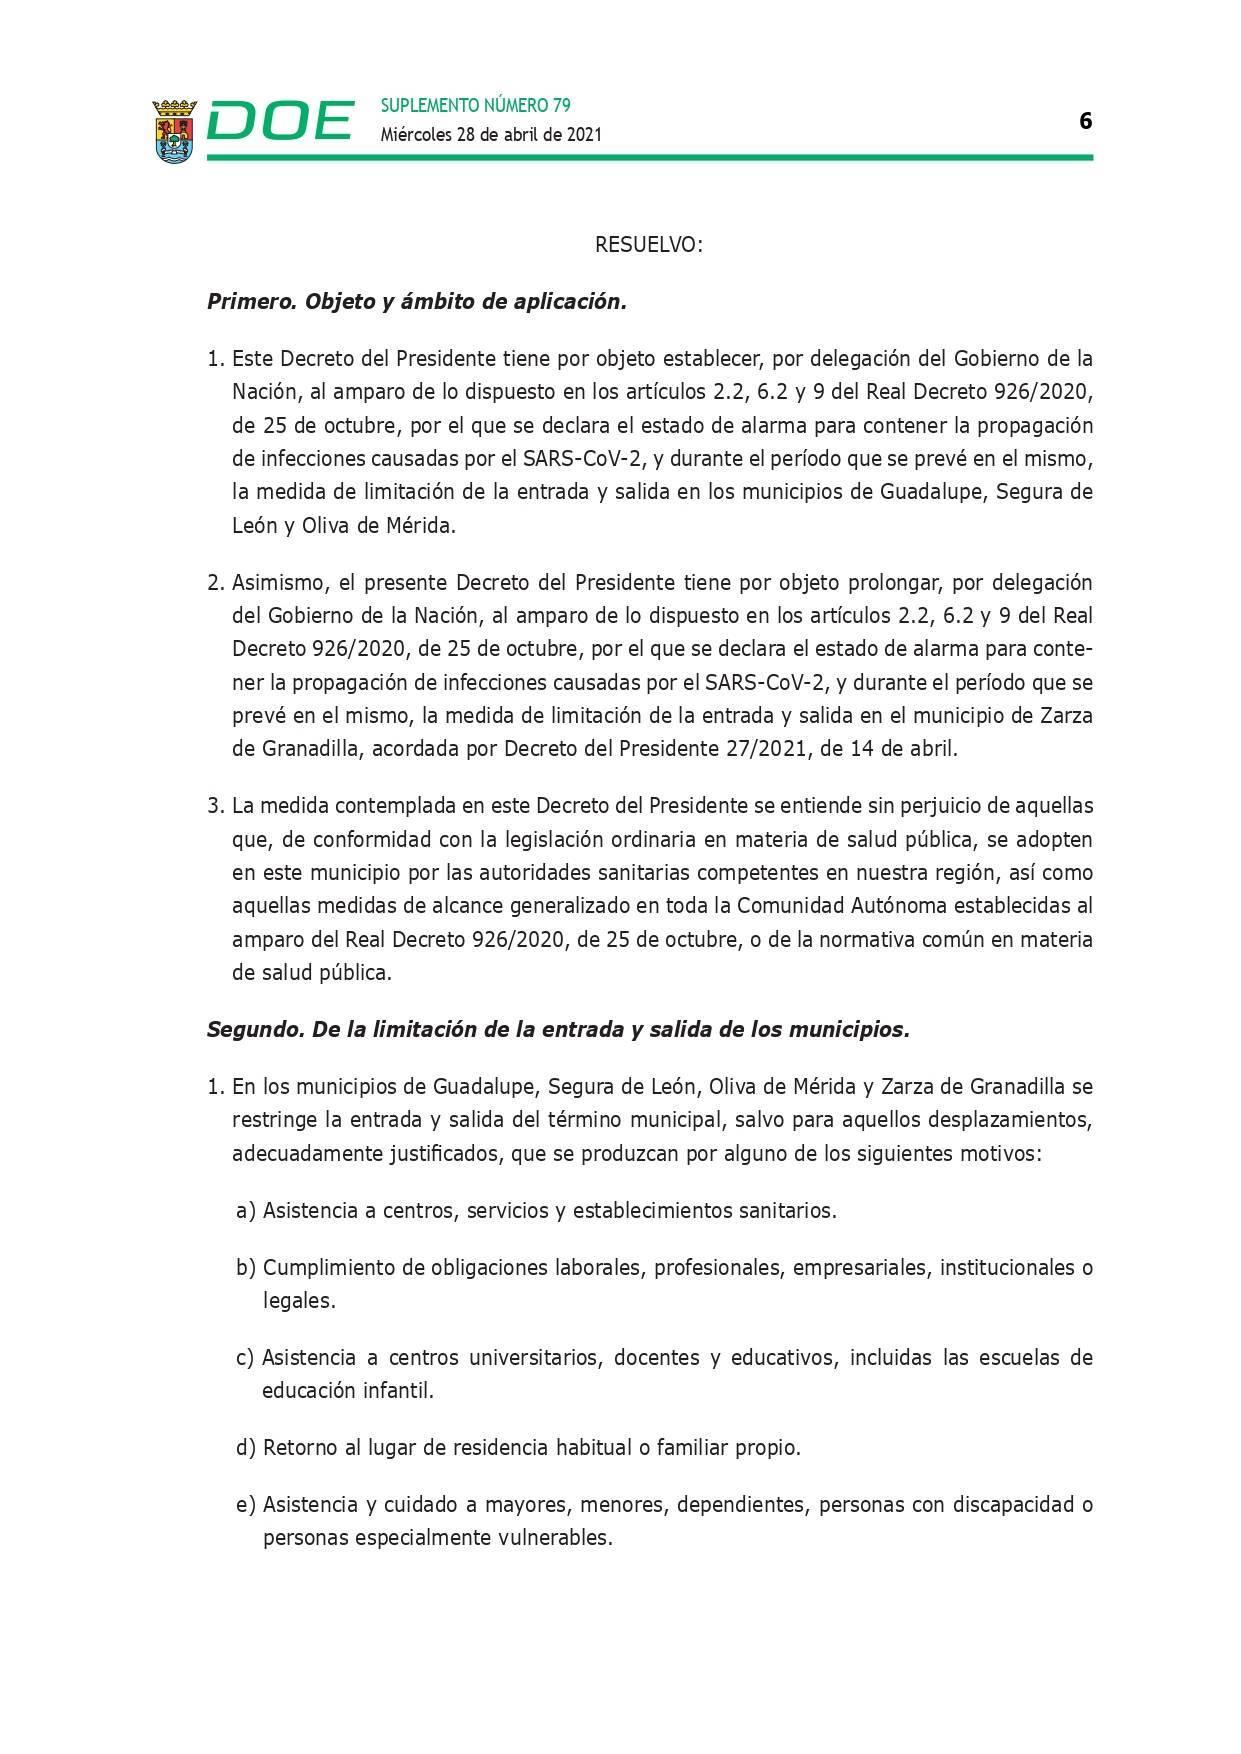 Cierre perimetral por COVID-19 (abril 2021) - Guadalupe (Cáceres) 6